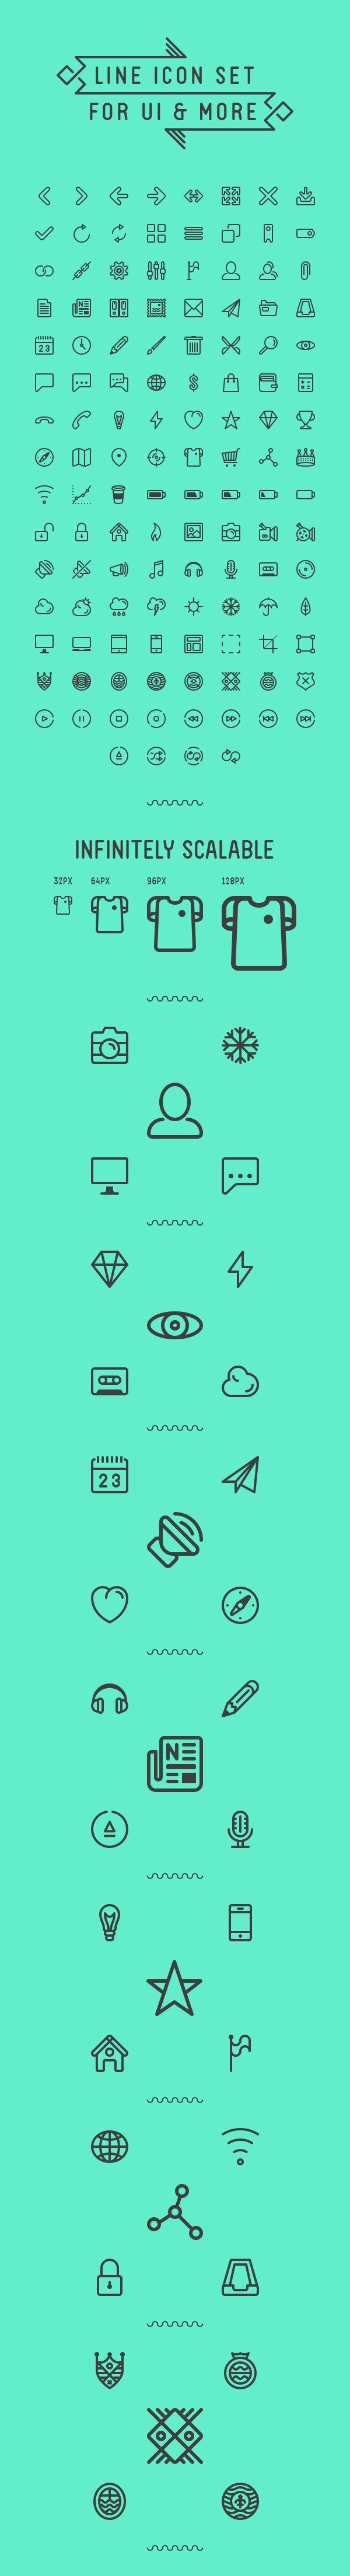 124 Free Line Icons